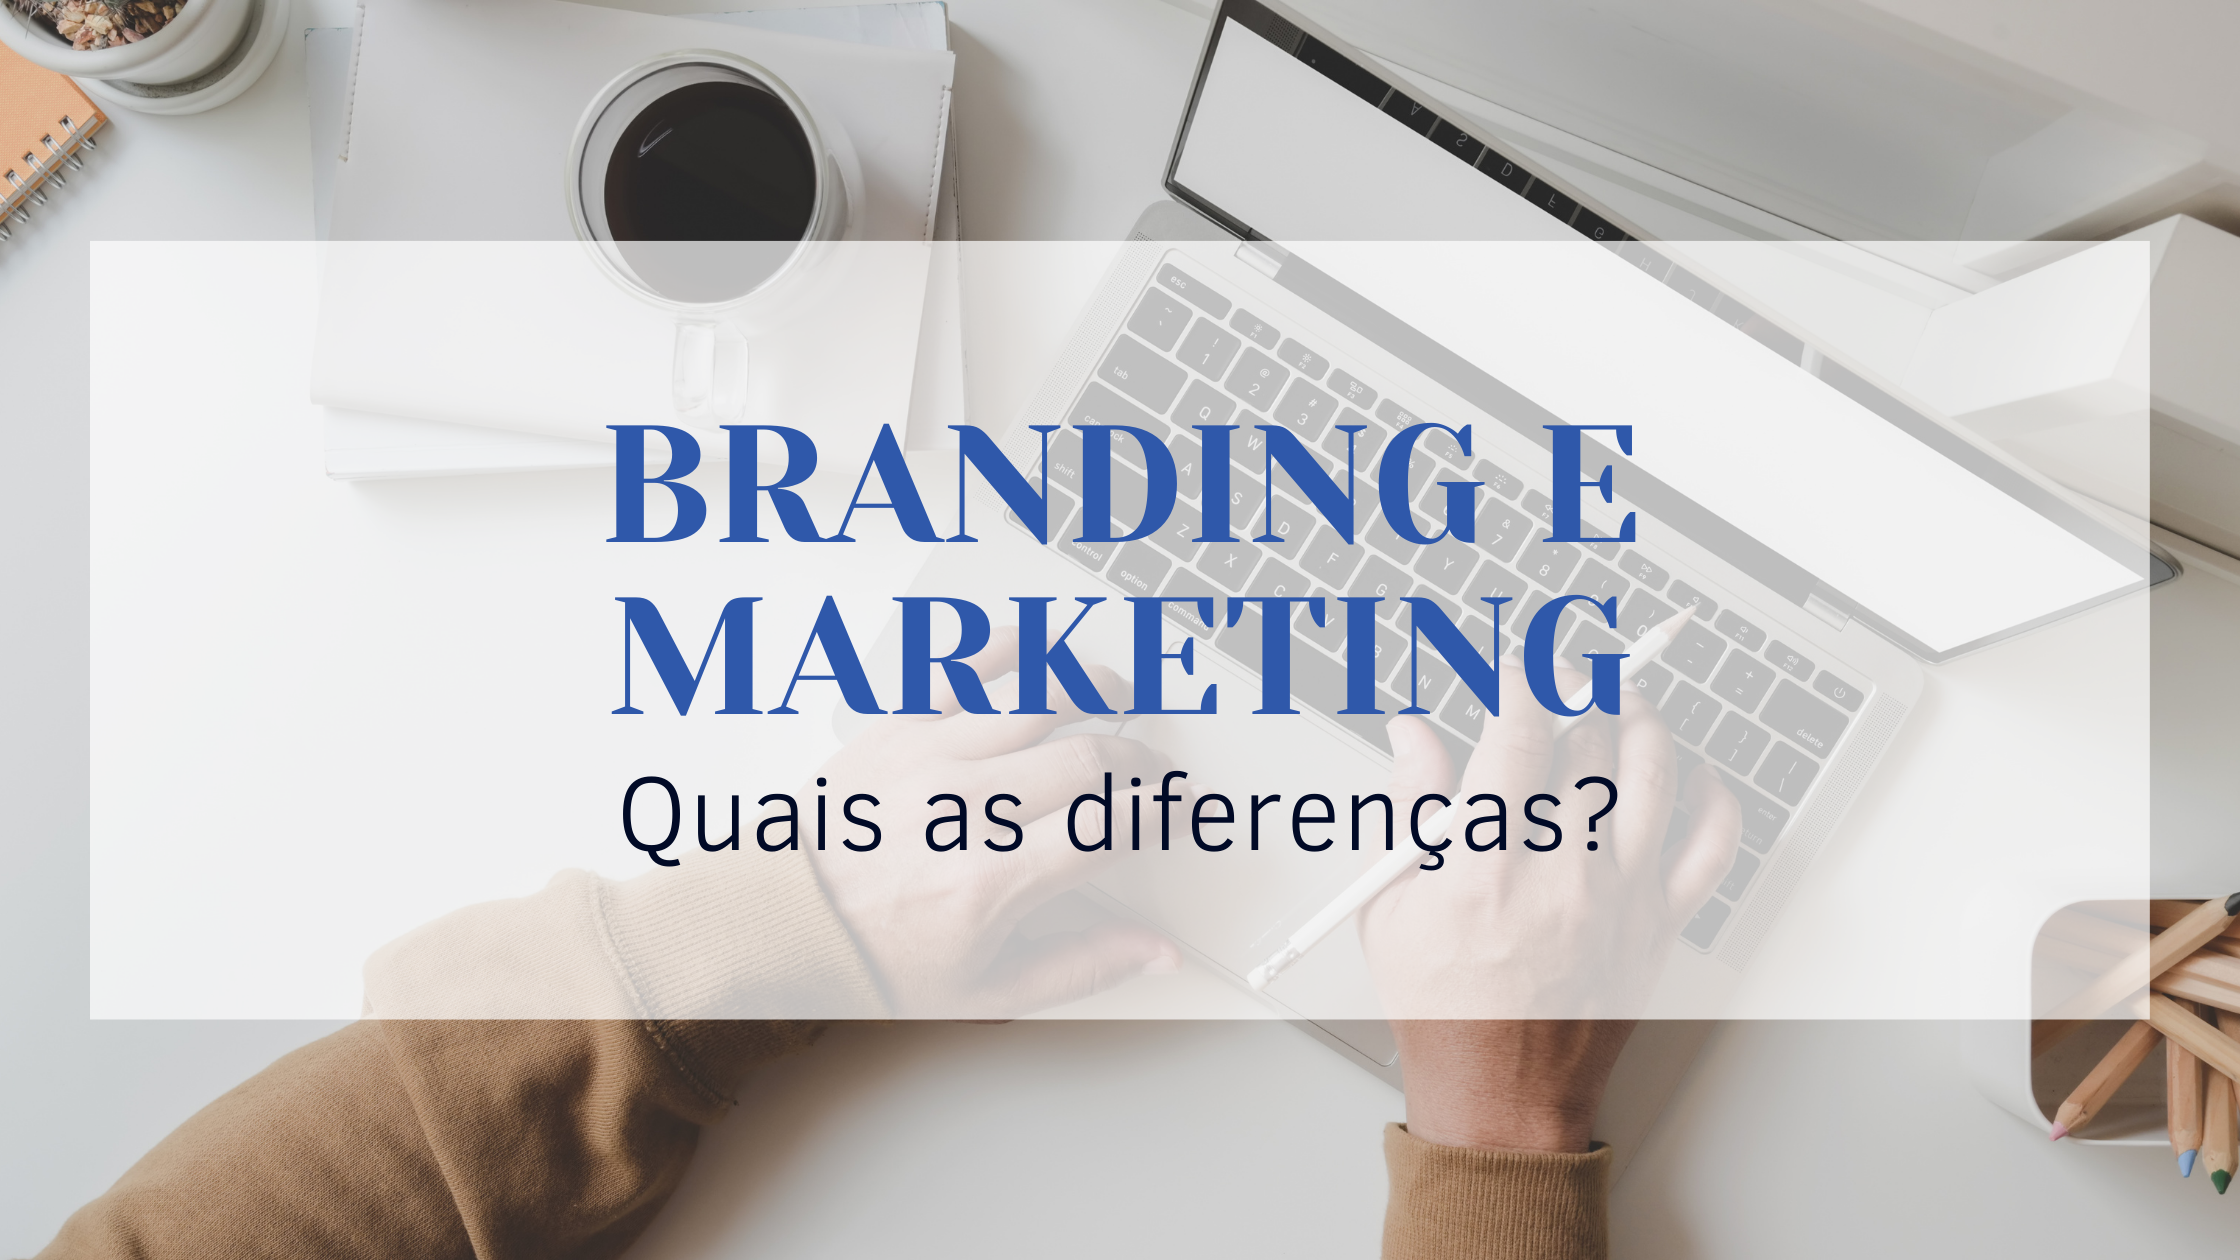 Branding e Marketing